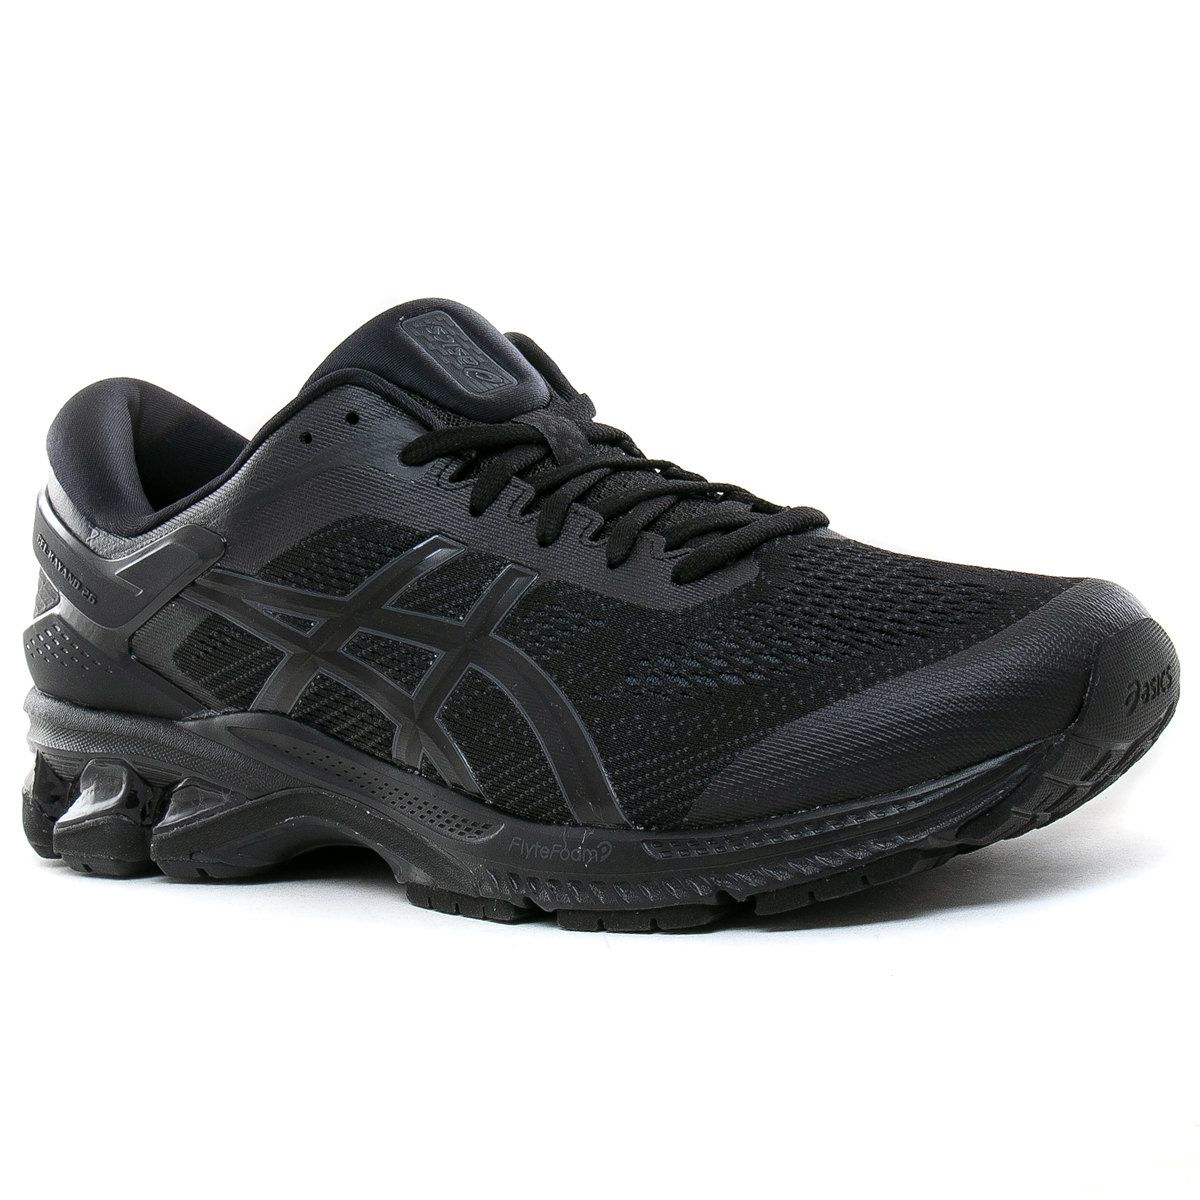 ASICS Gel-Mission Hombre Negro Exterior Andar Deporte Running Zapatos Zapatillas